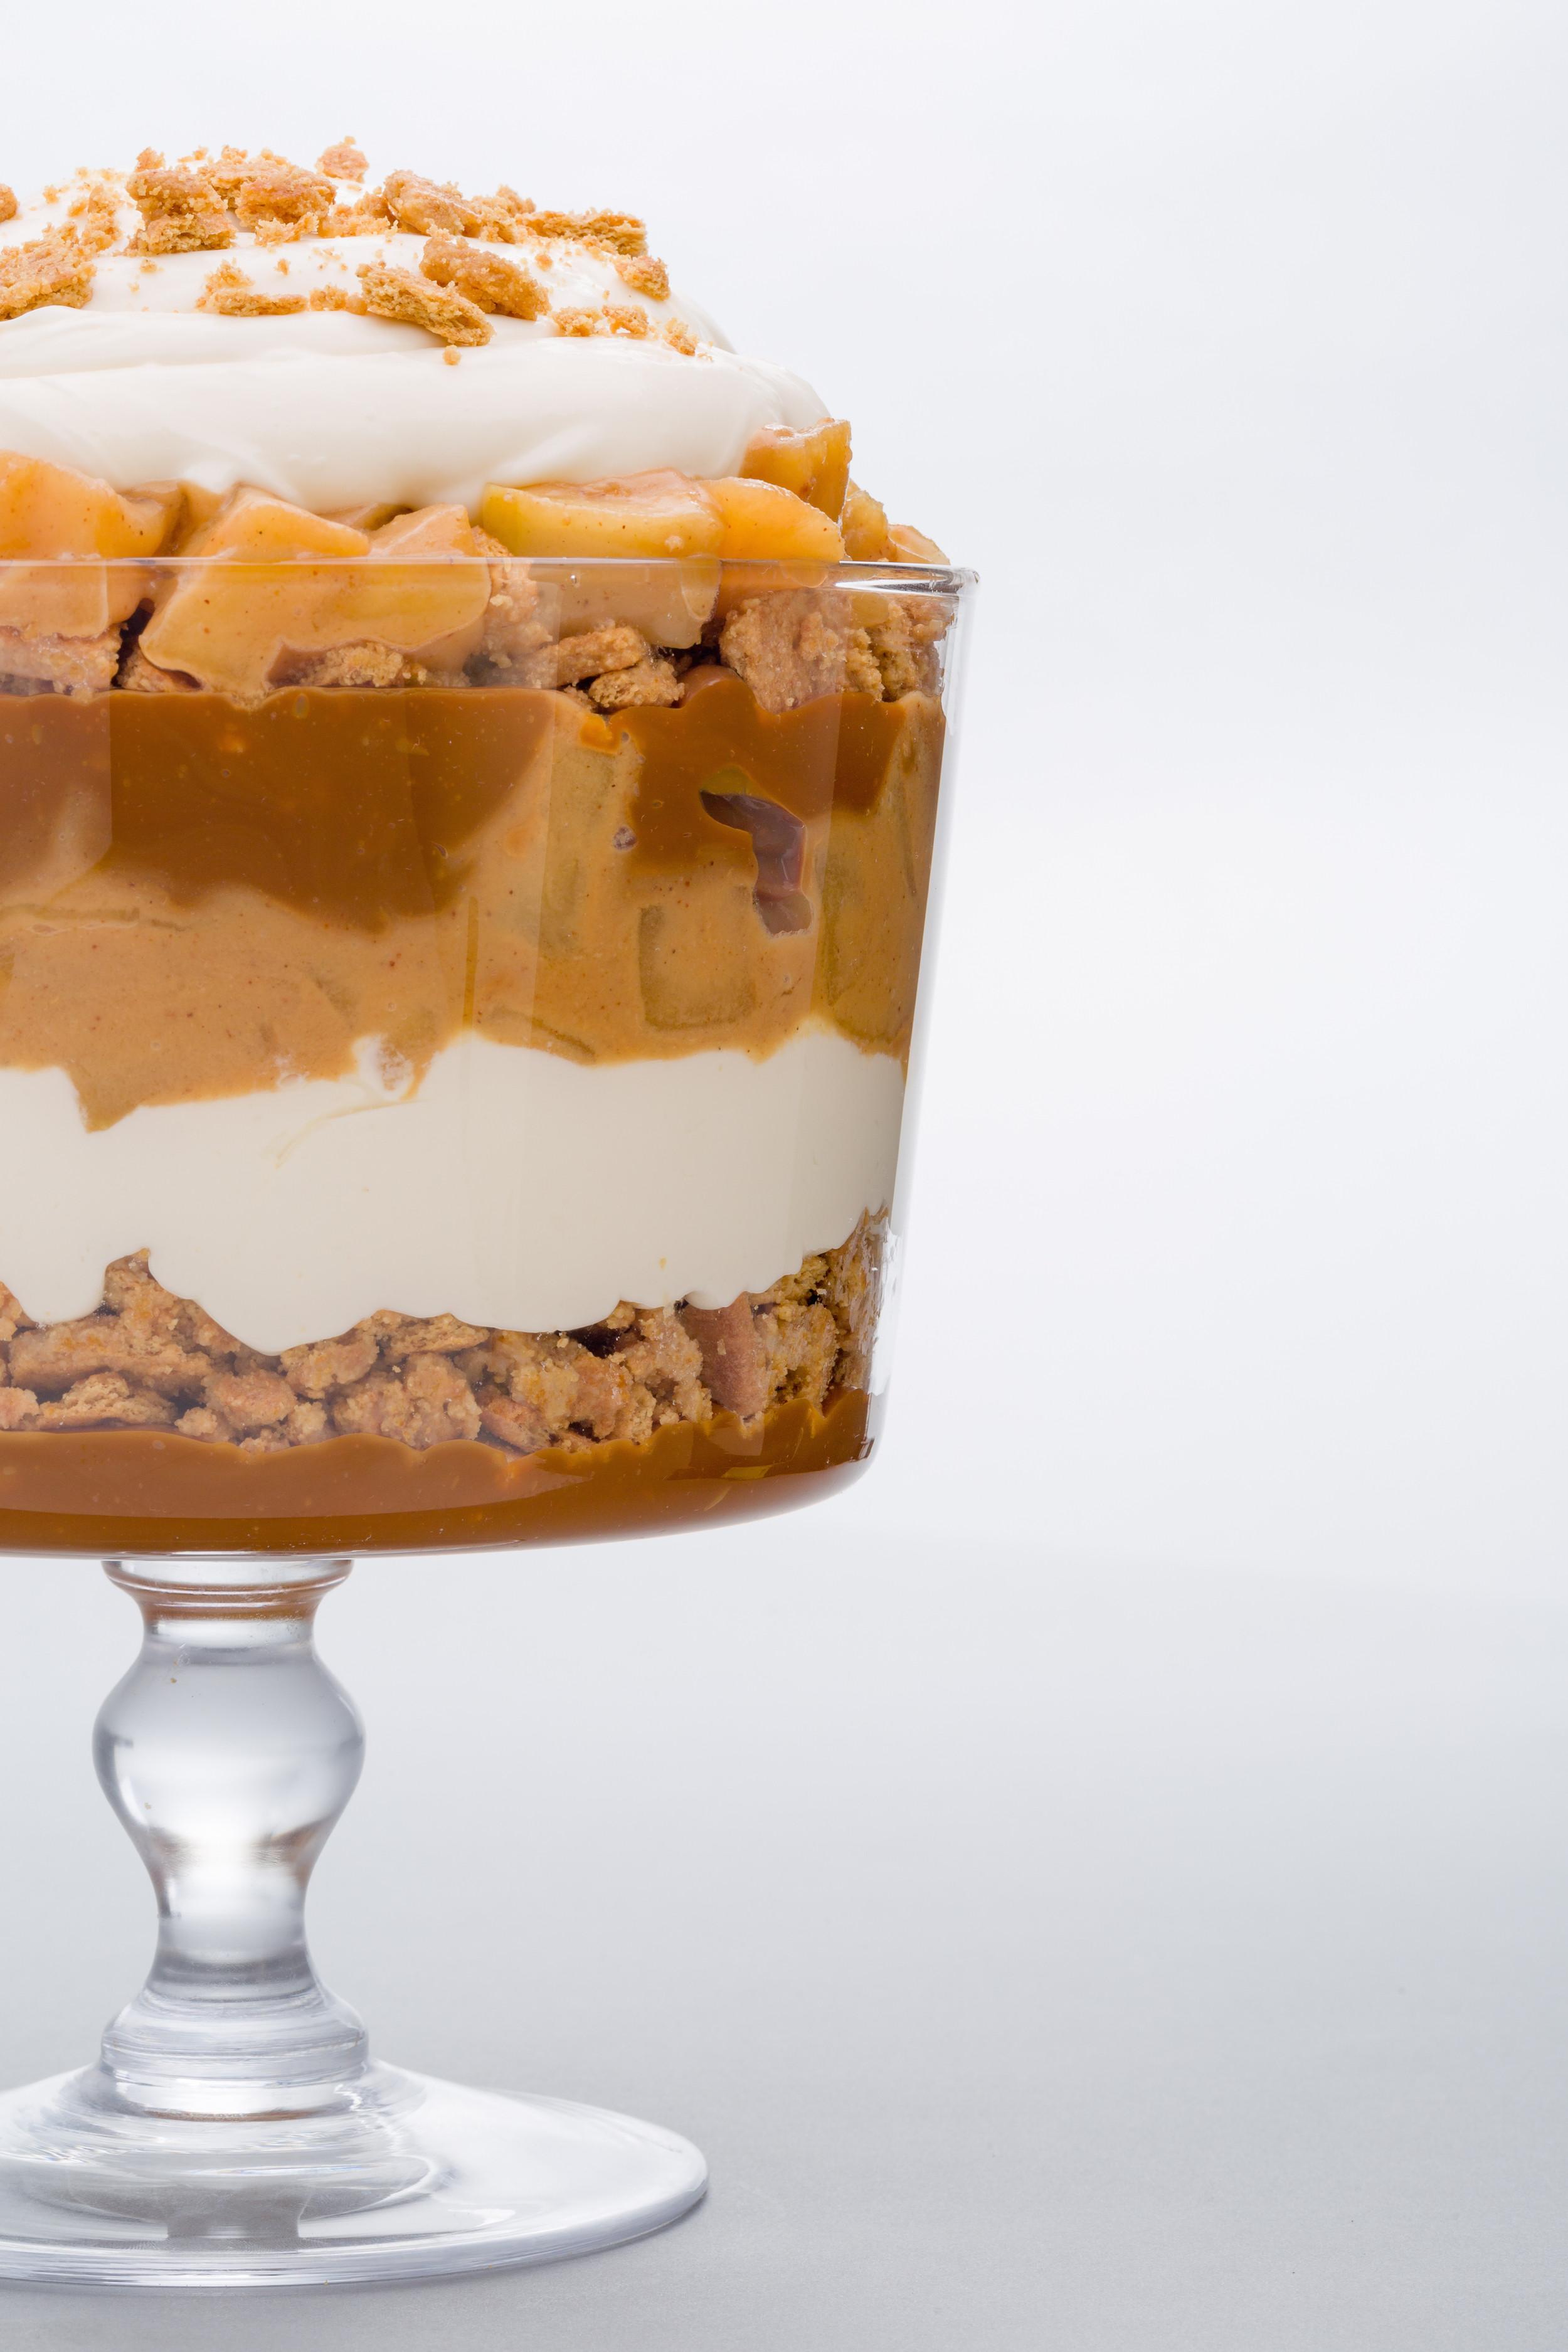 Christmas Trifle Dessert  17 Christmas Trifle Recipes Easy Holiday Trifle Desserts